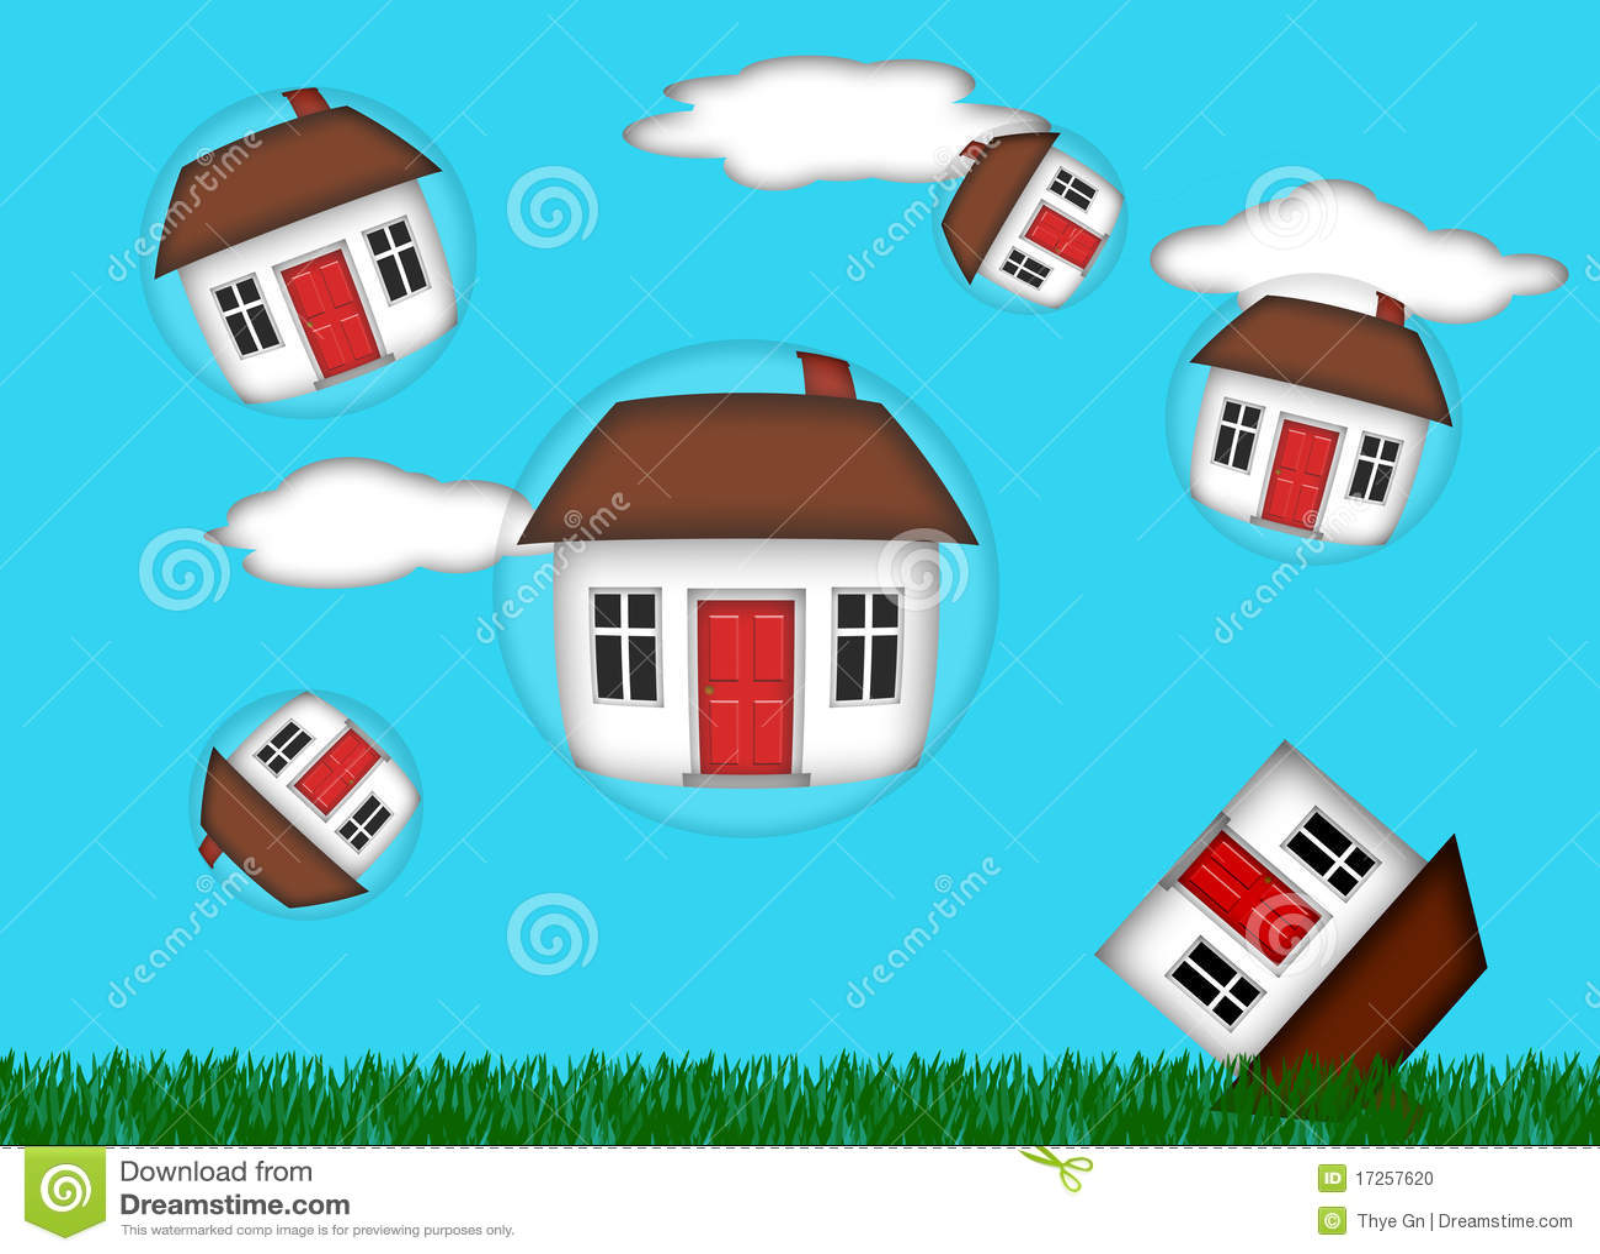 real estate bubble and financial crisis 2012-9-5 then came the financial crisis four years ago and the great recession  when the nasdaq technology stock bubble burst  a real estate crash.